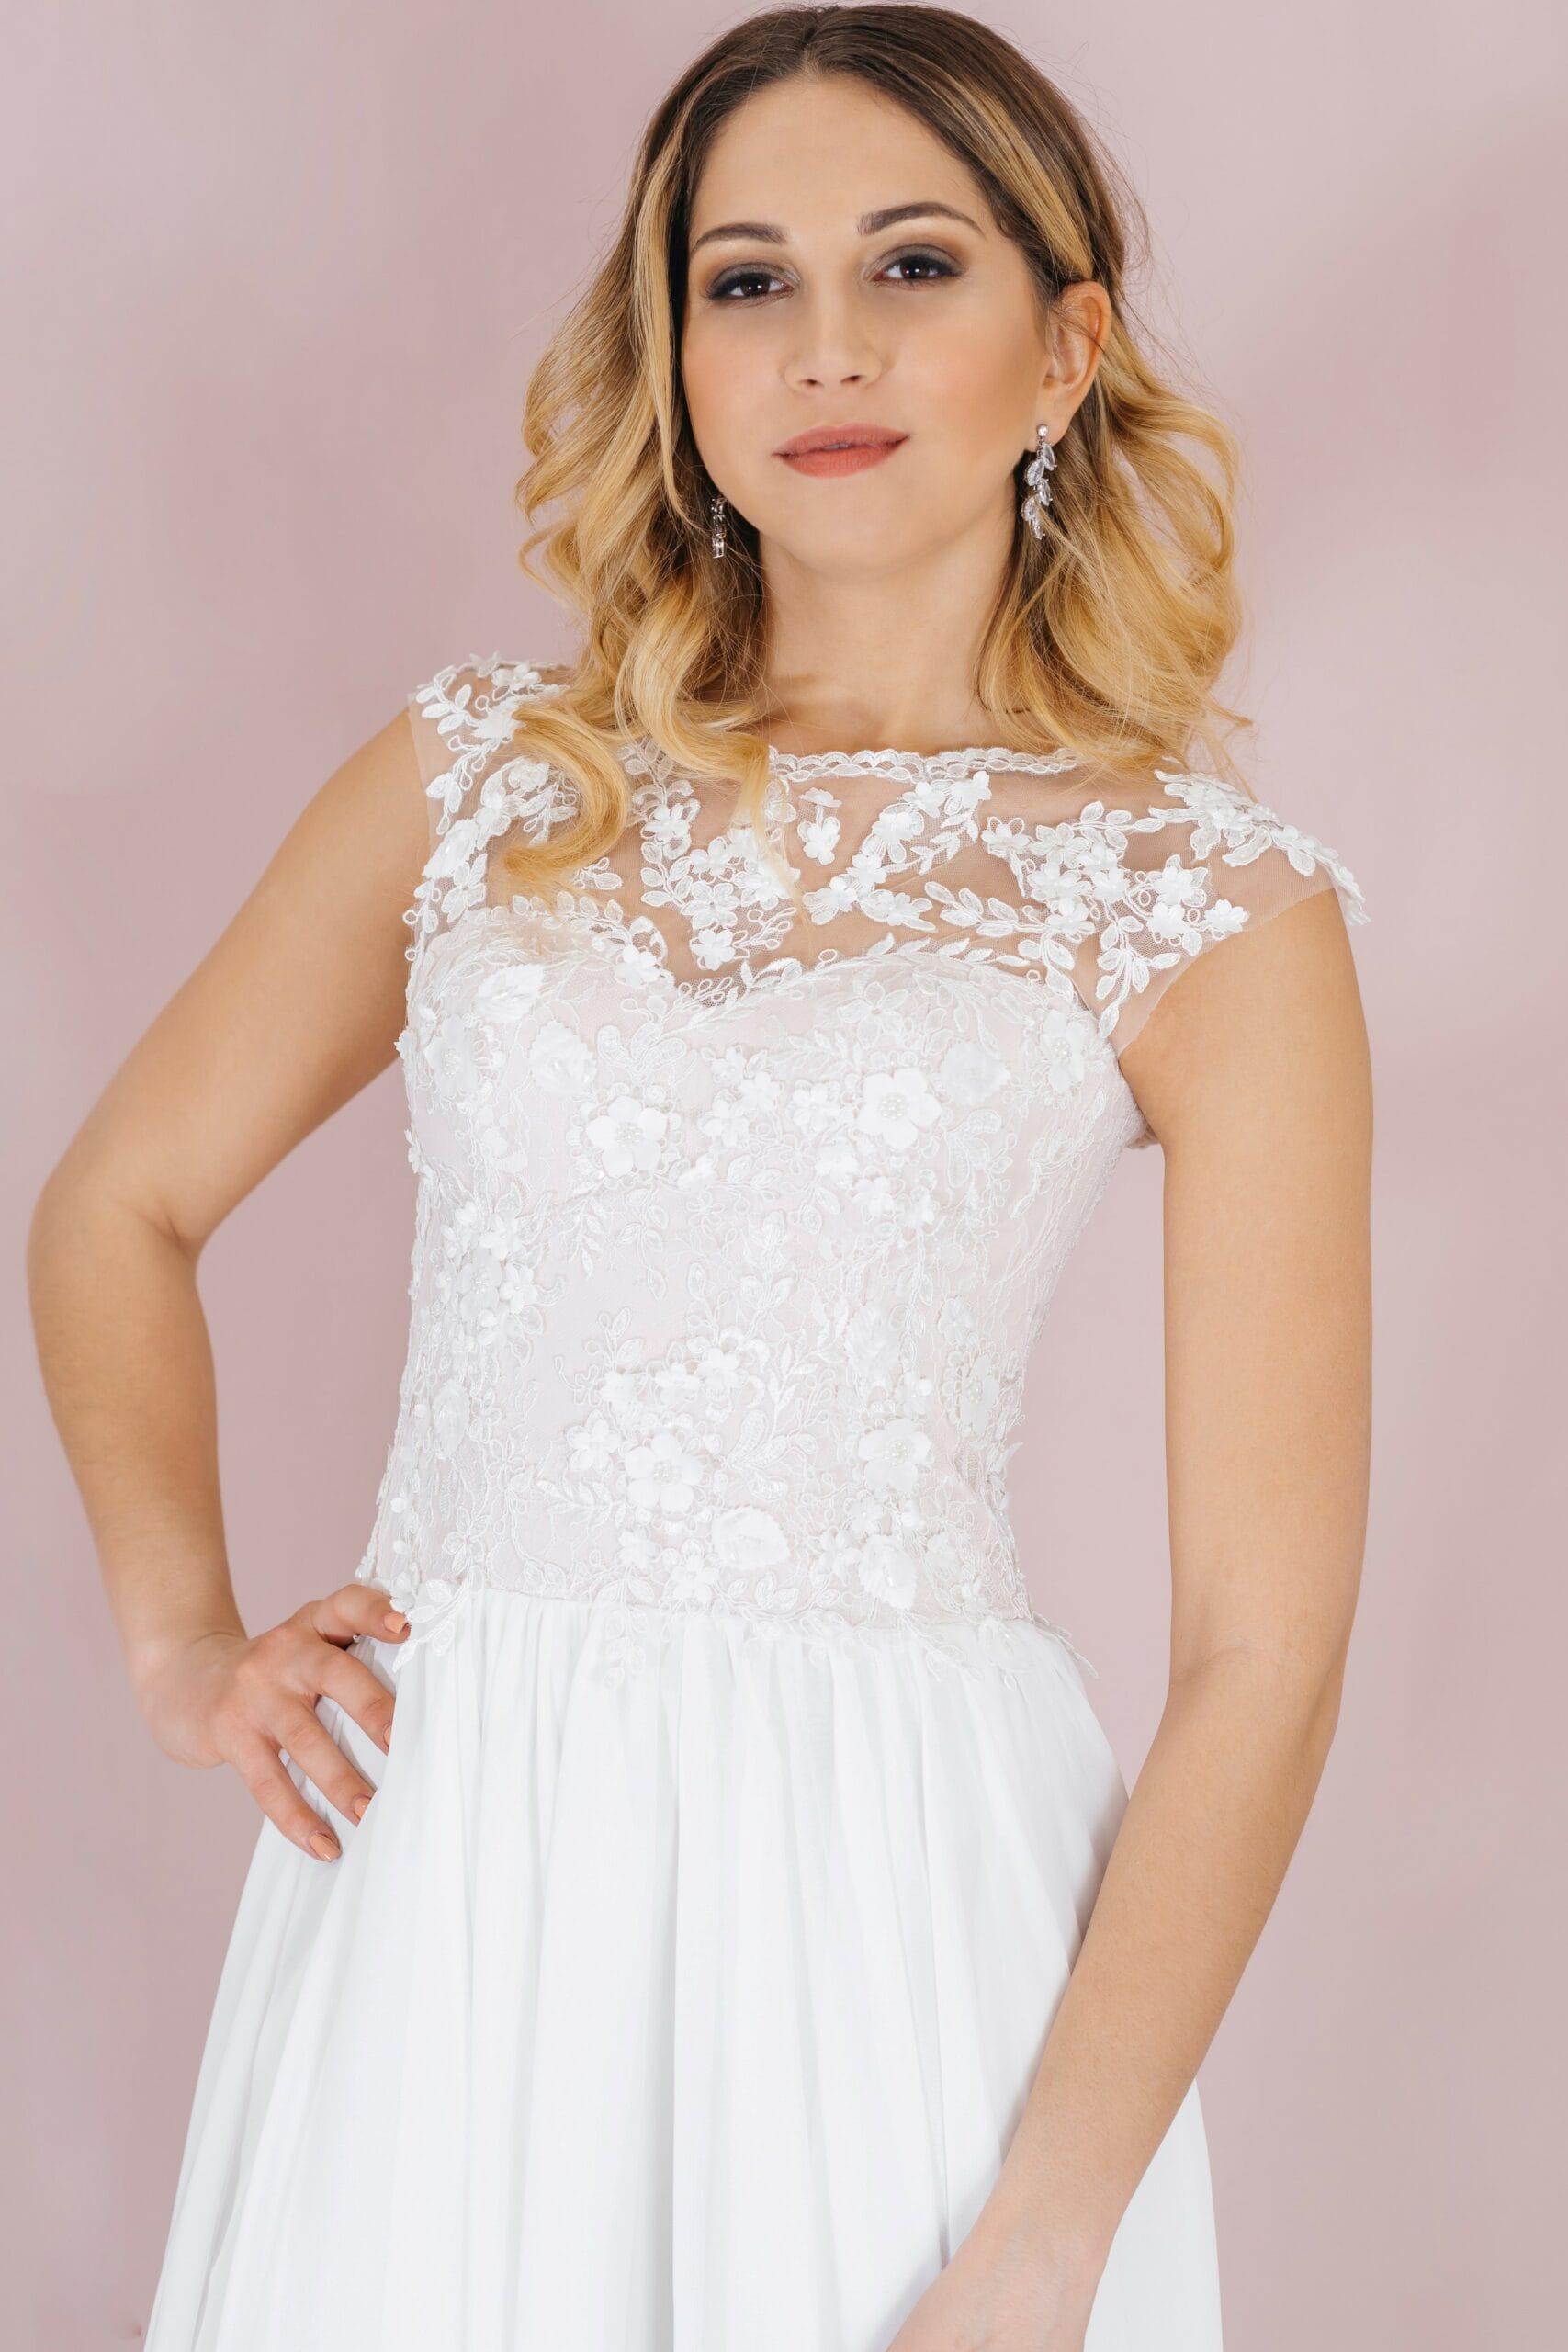 Свадебное платье SOPHIA, коллекция LOFT, бренд RARE BRIDAL, фото 5